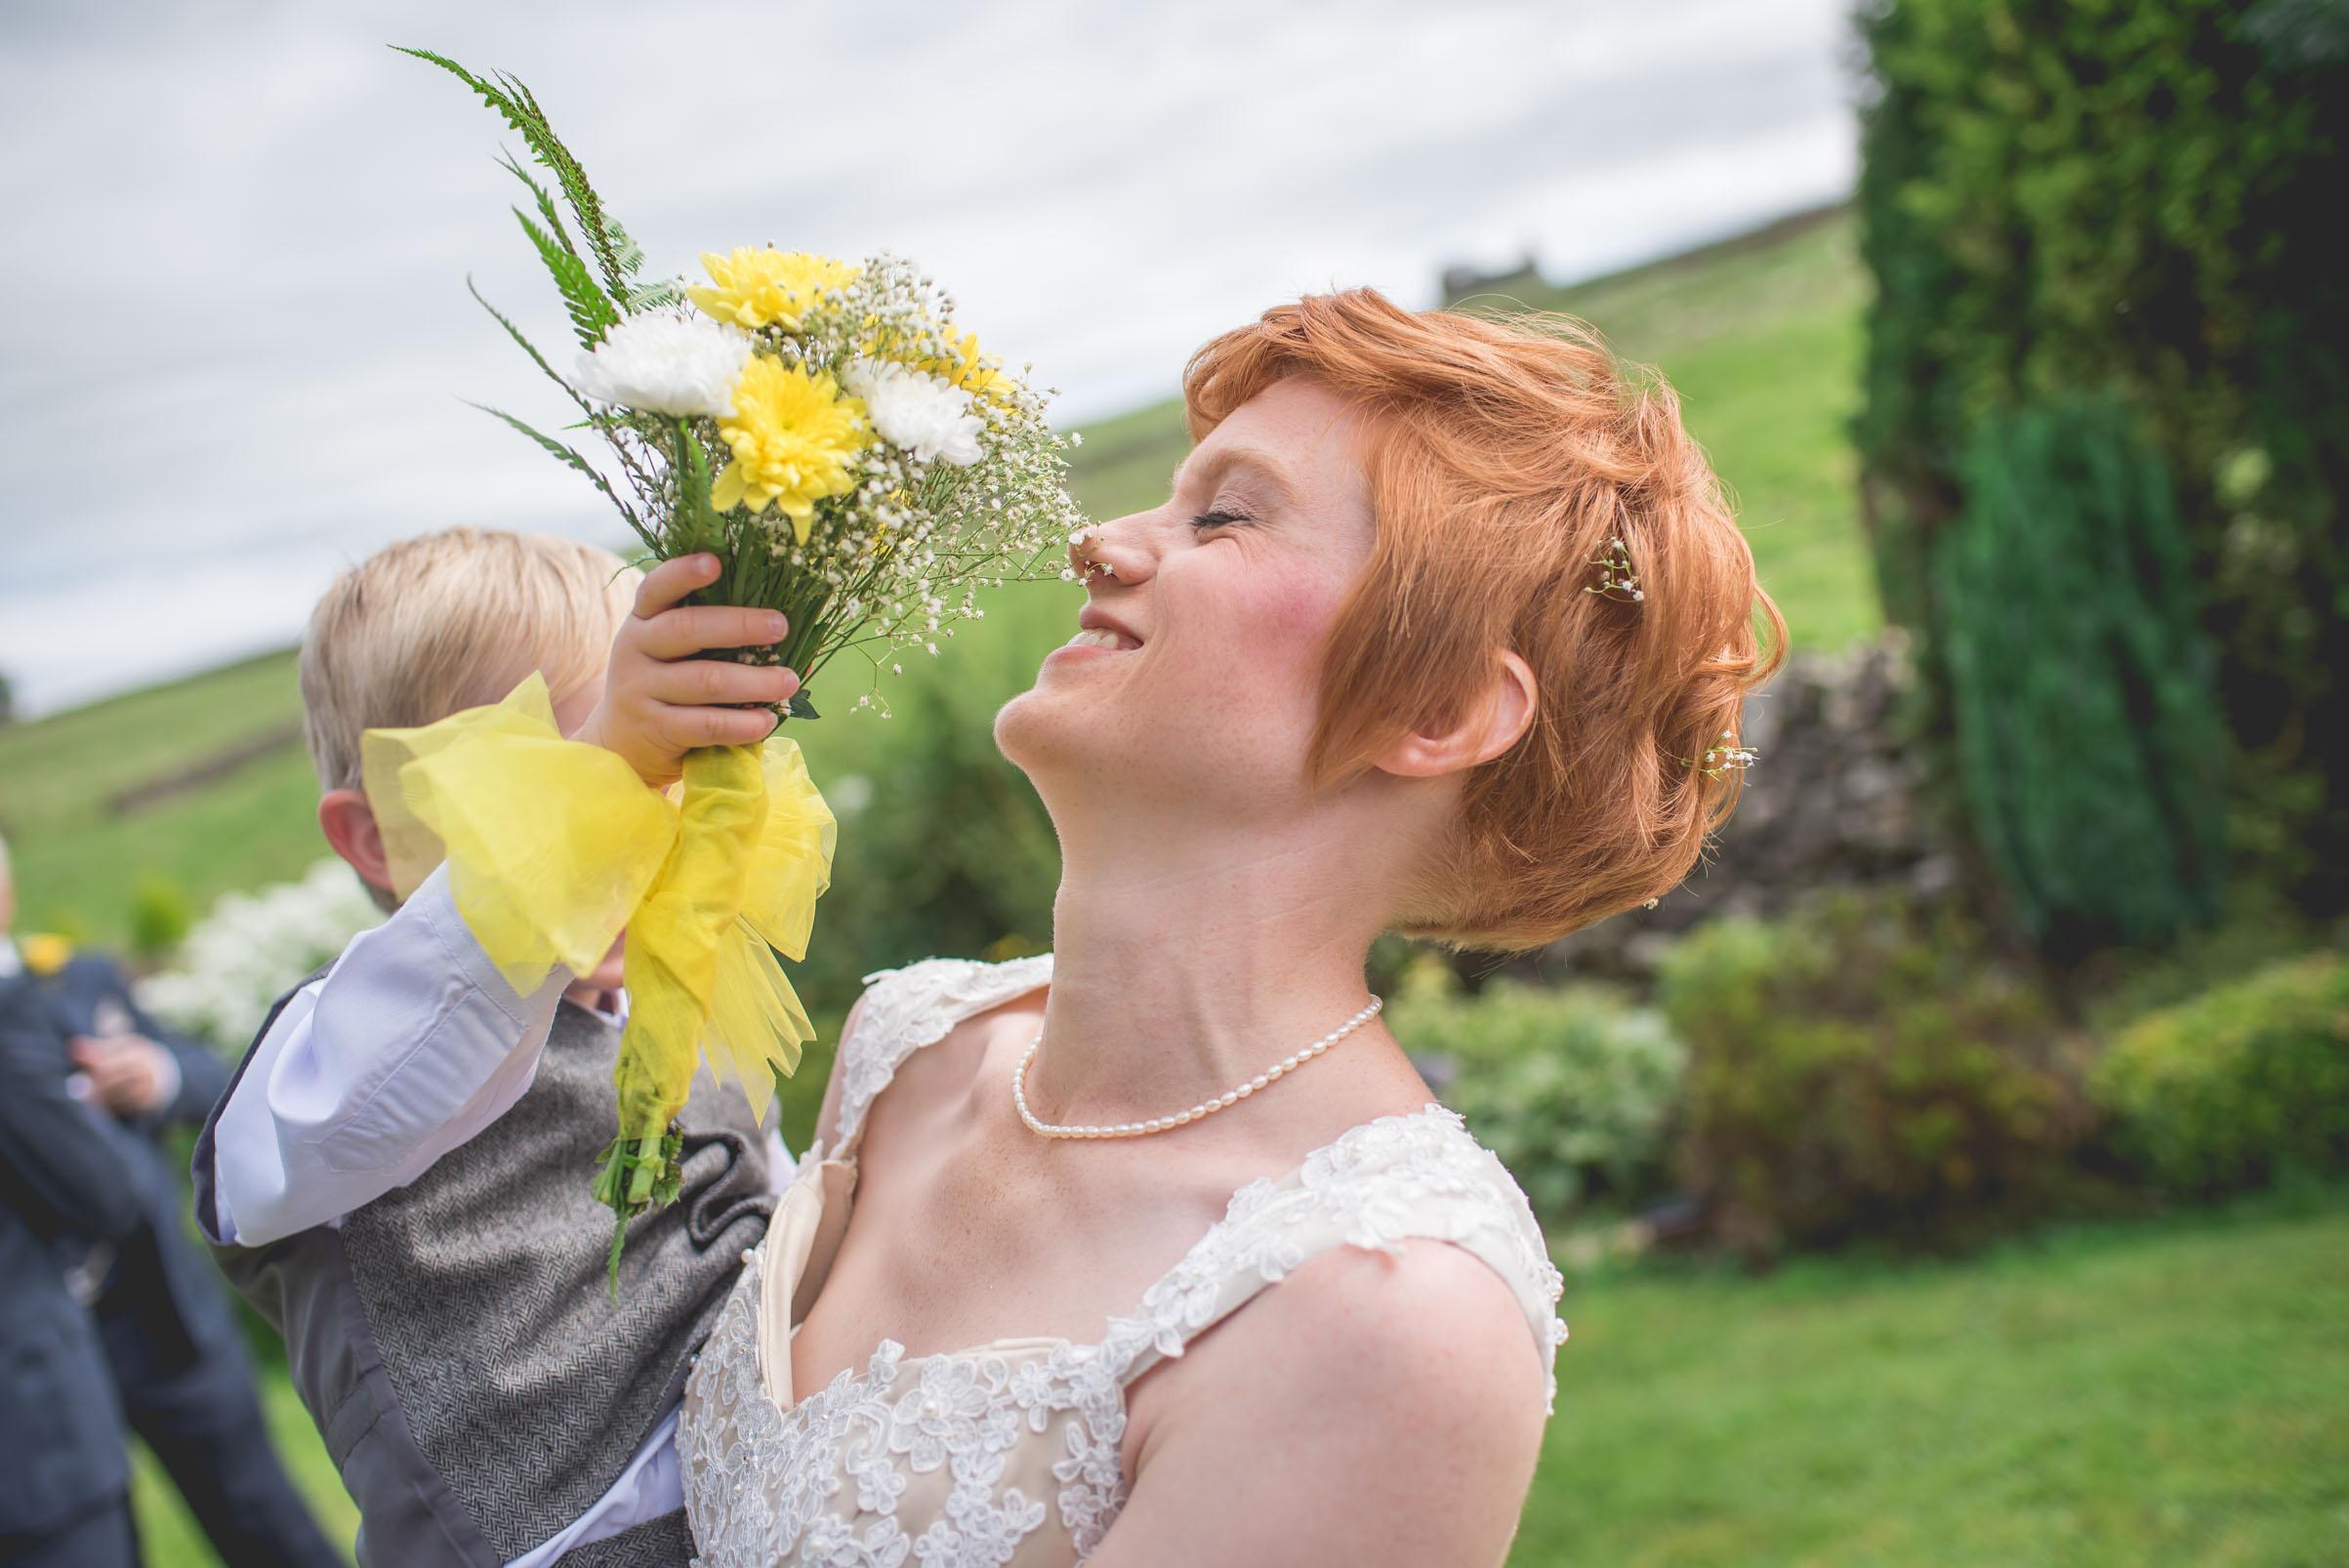 Peak+district+farm+wedding+lower+damgate+photographer-76.jpg